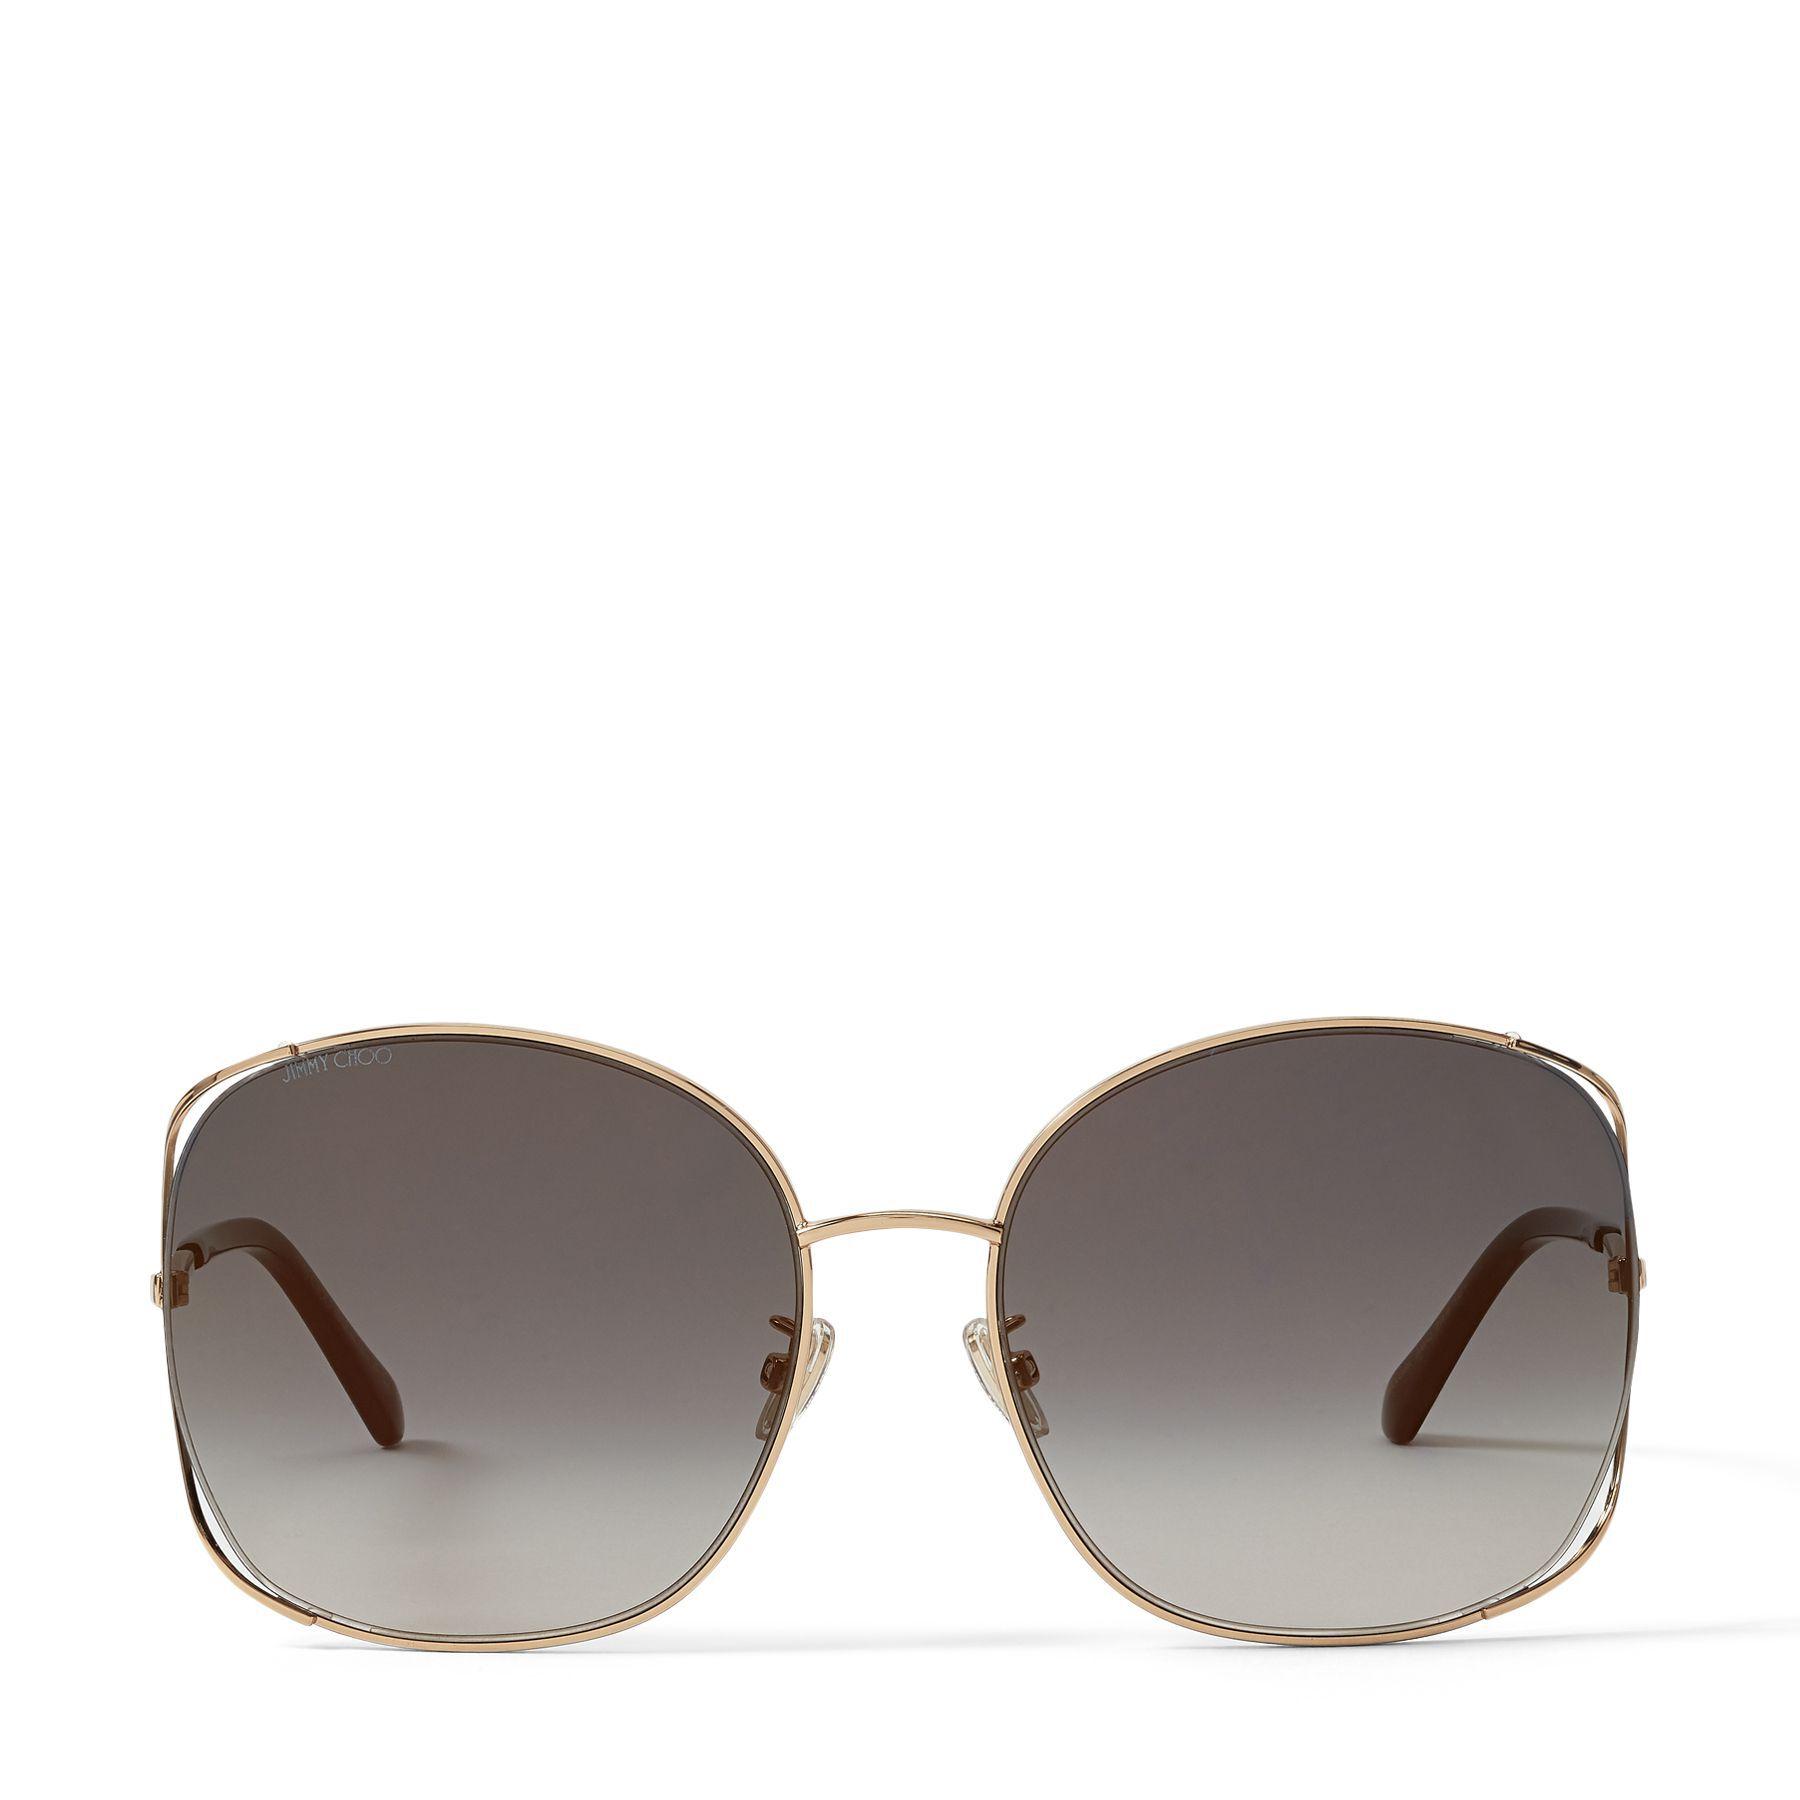 TINKA - Rose Gold Oval-Frame Sunglasses with Crystal Embellishment